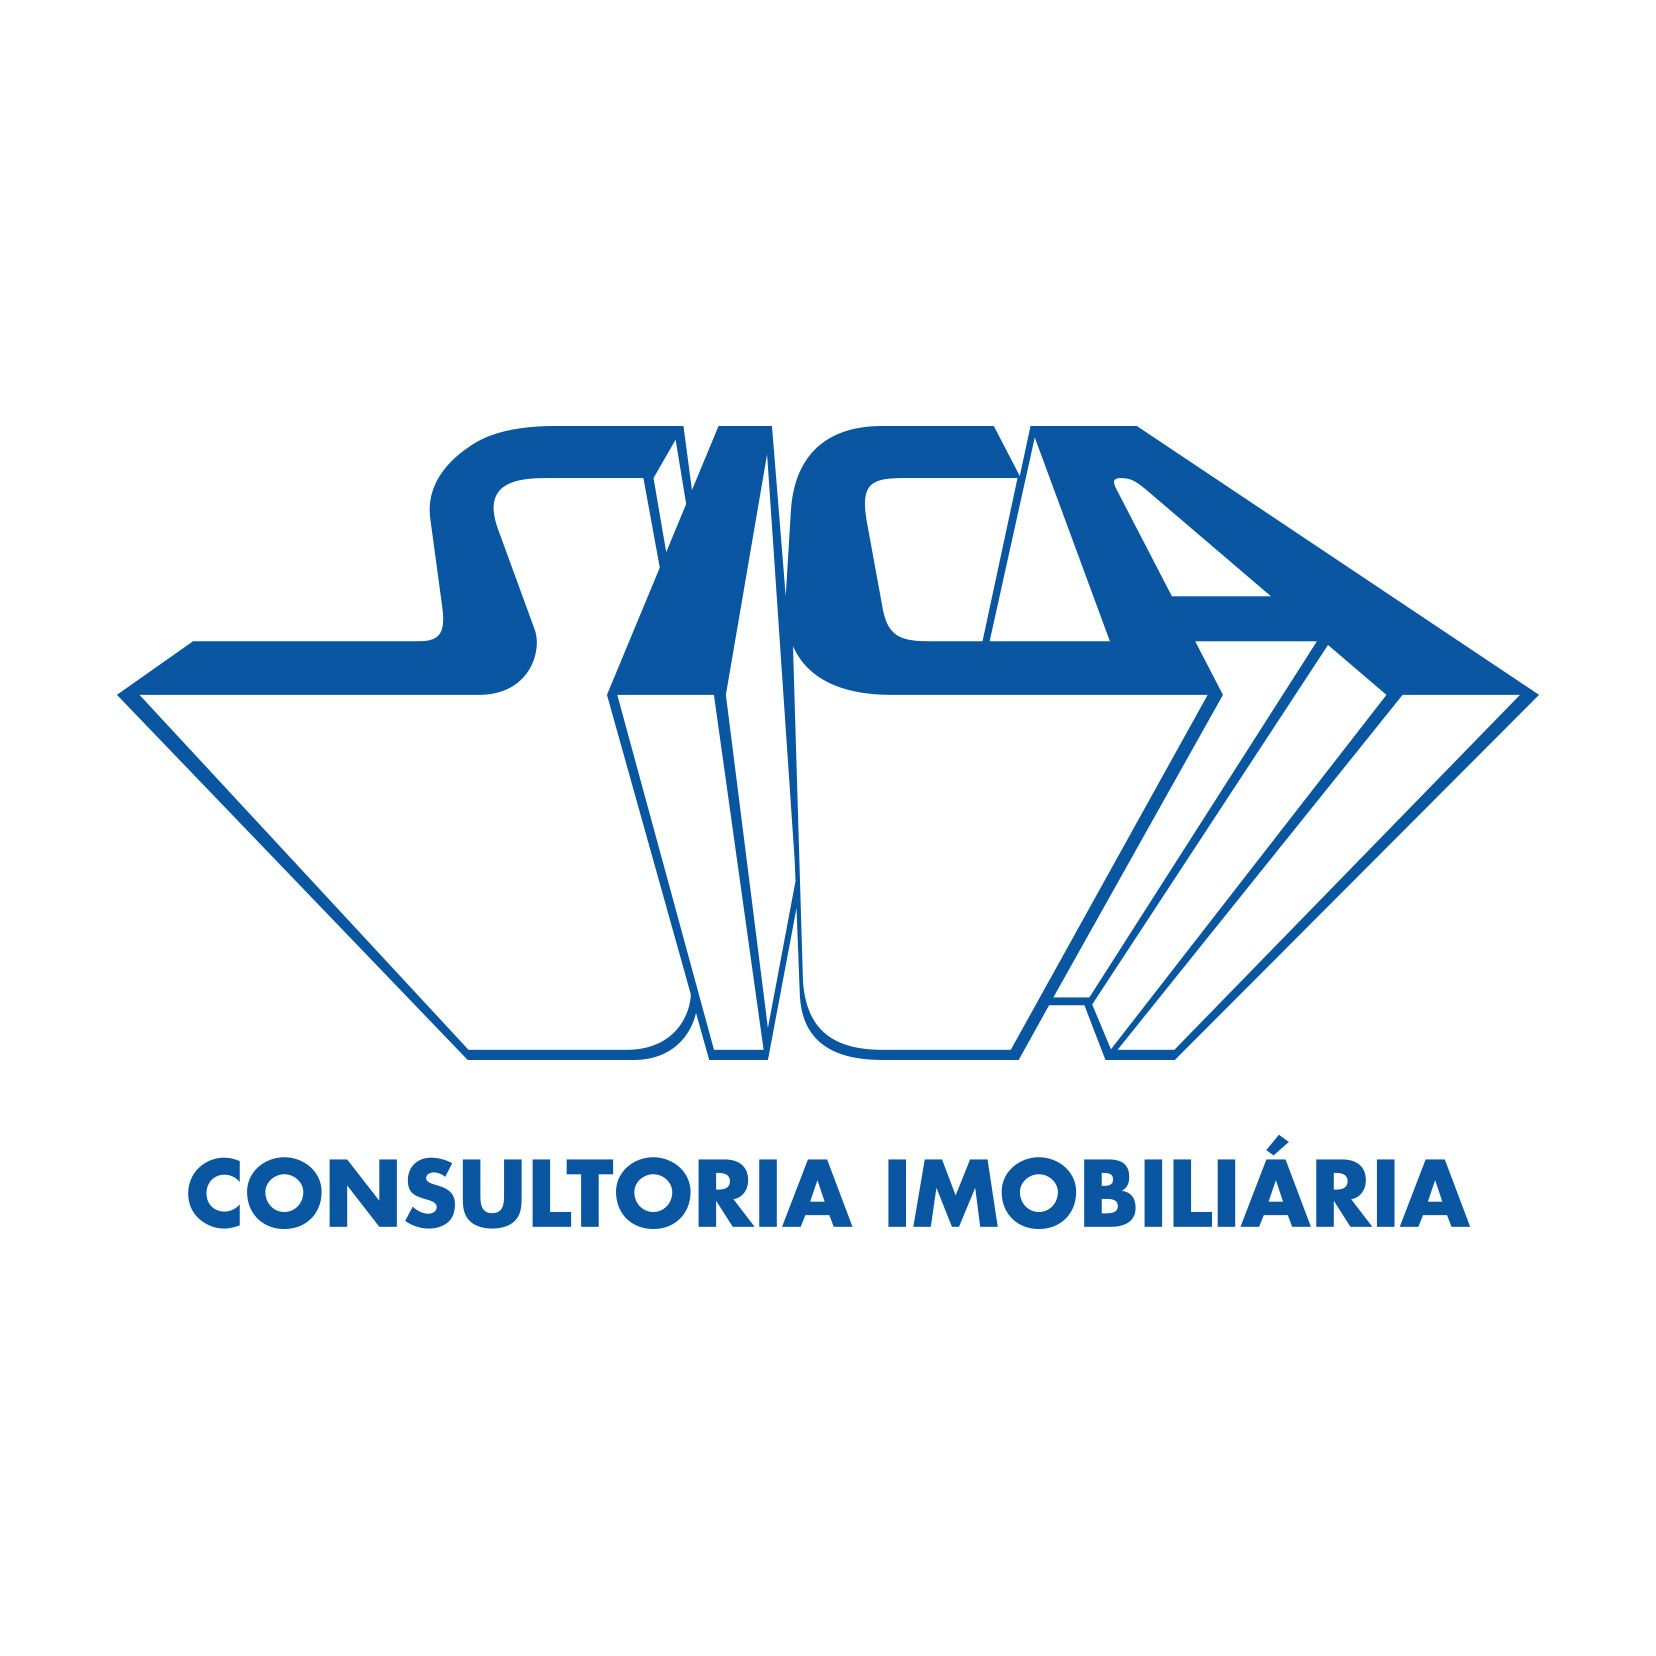 Logo de  Sica Consultoria Imobiliaria